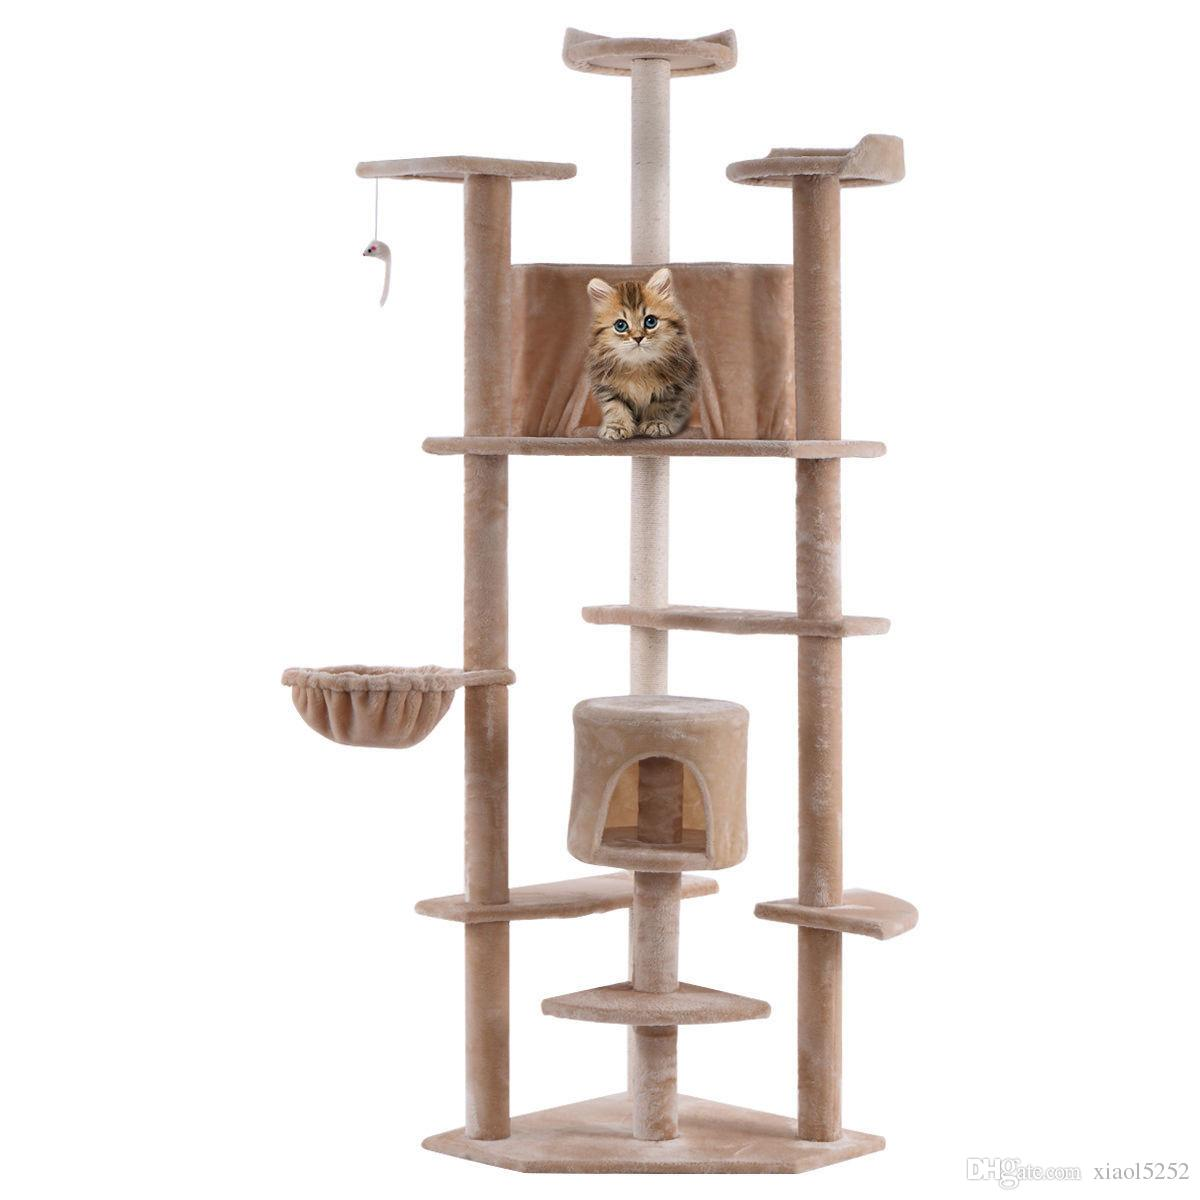 Attirant 2018 Beige New 80 Cat Tree Condo Furniture Scratch Post Pet House From  Xiaol5252, $40.21 | Dhgate.Com